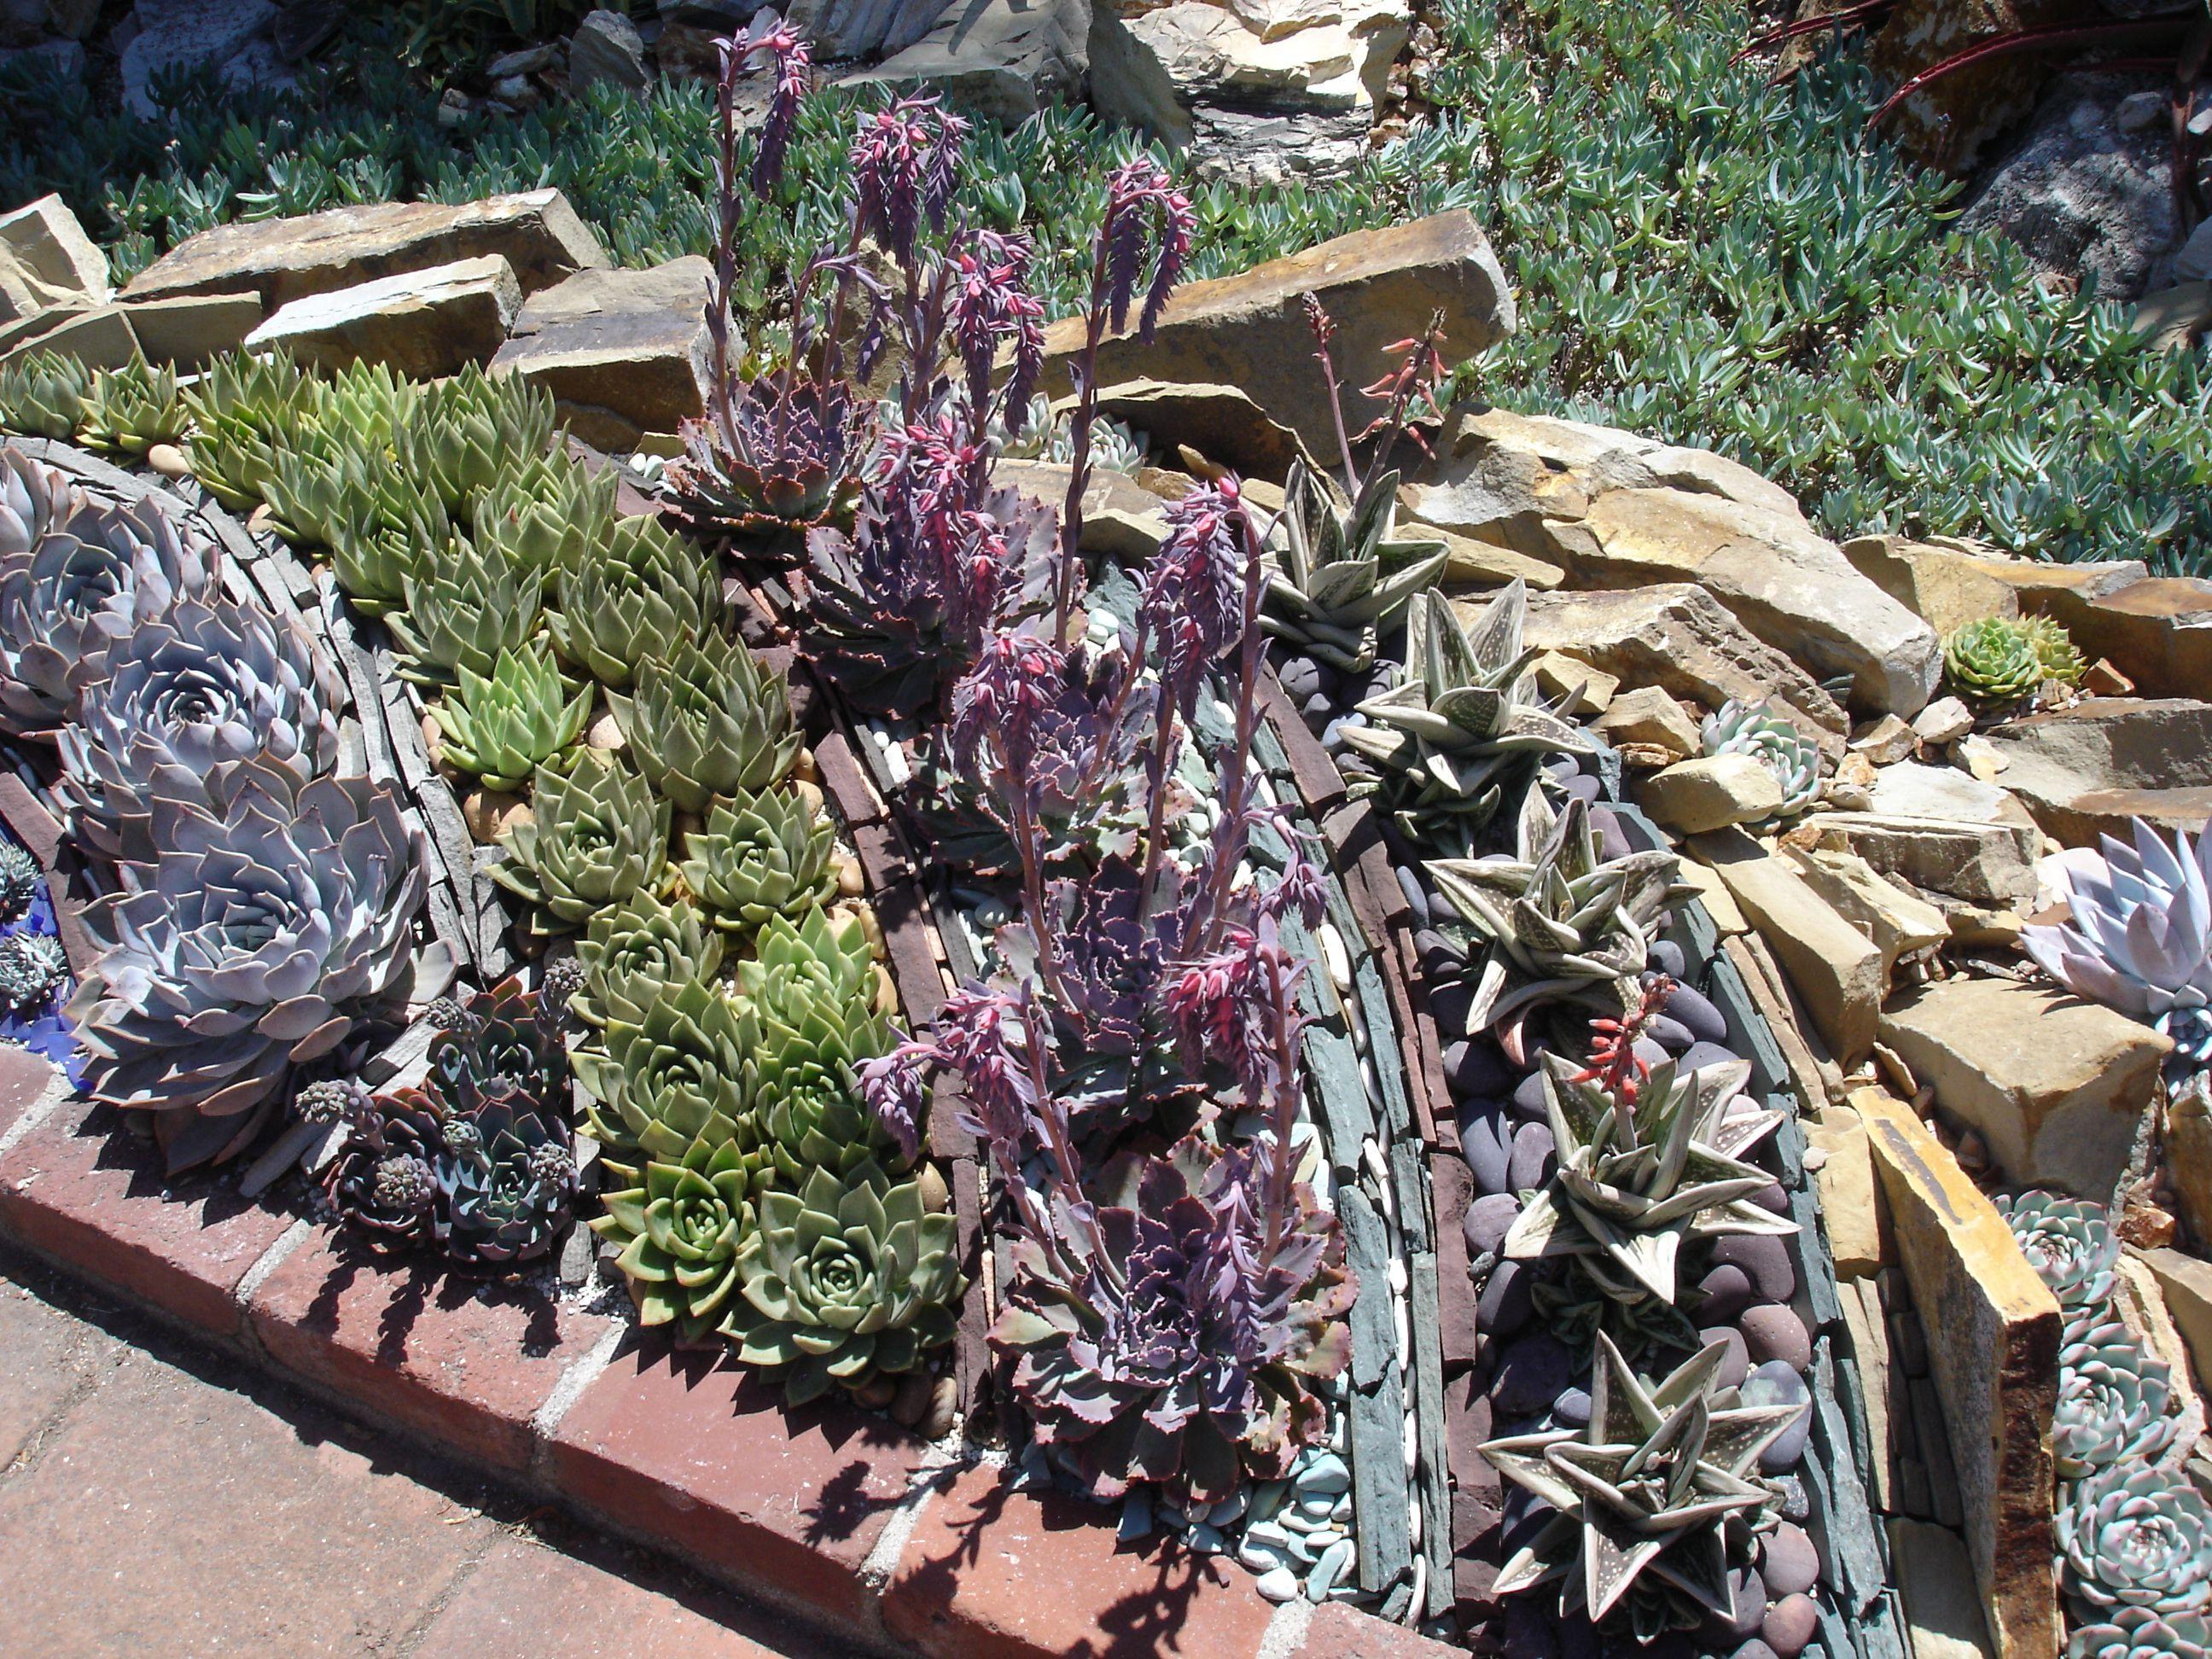 5232fe680d8b6edb967baefb559999a7 - Botanical Gardens Corona Del Mar Ca